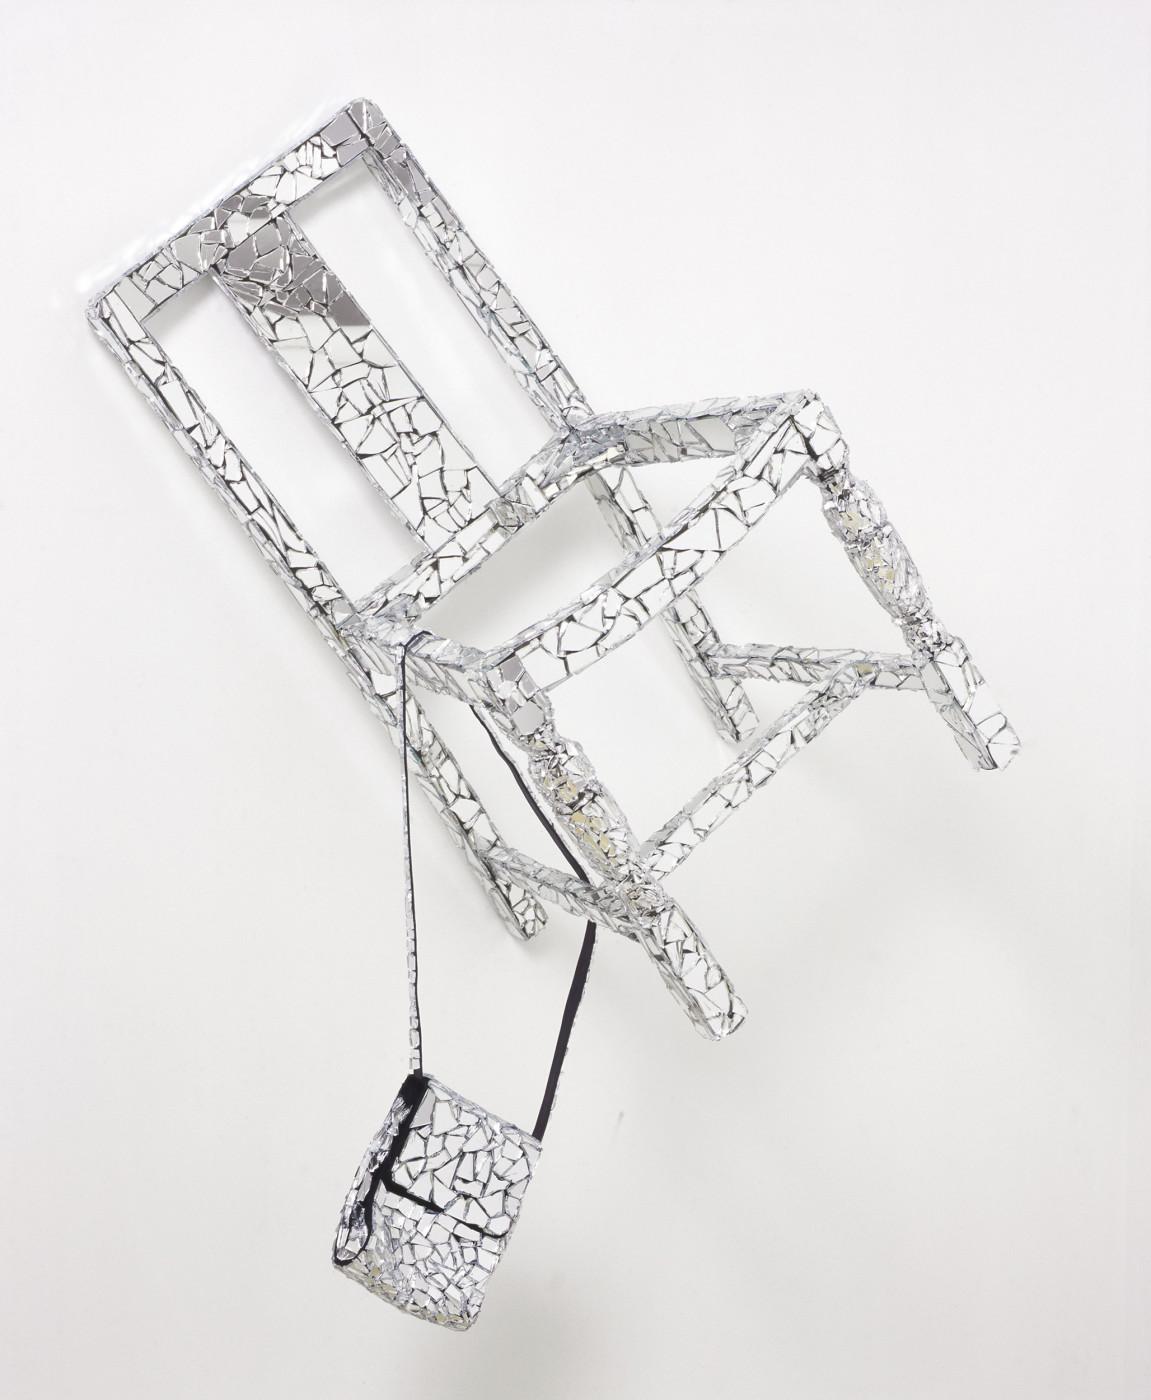 "<div class=""title""><em>Danceteria VI</em>, 2006</div><div class=""medium"">broken mirror, chair, handbag, glue</div><div class=""dimensions"">128.0 x 84.0 x 48.0 cm<br />50 3/8 x 33 1/8 x 18 7/8 in.</div>"